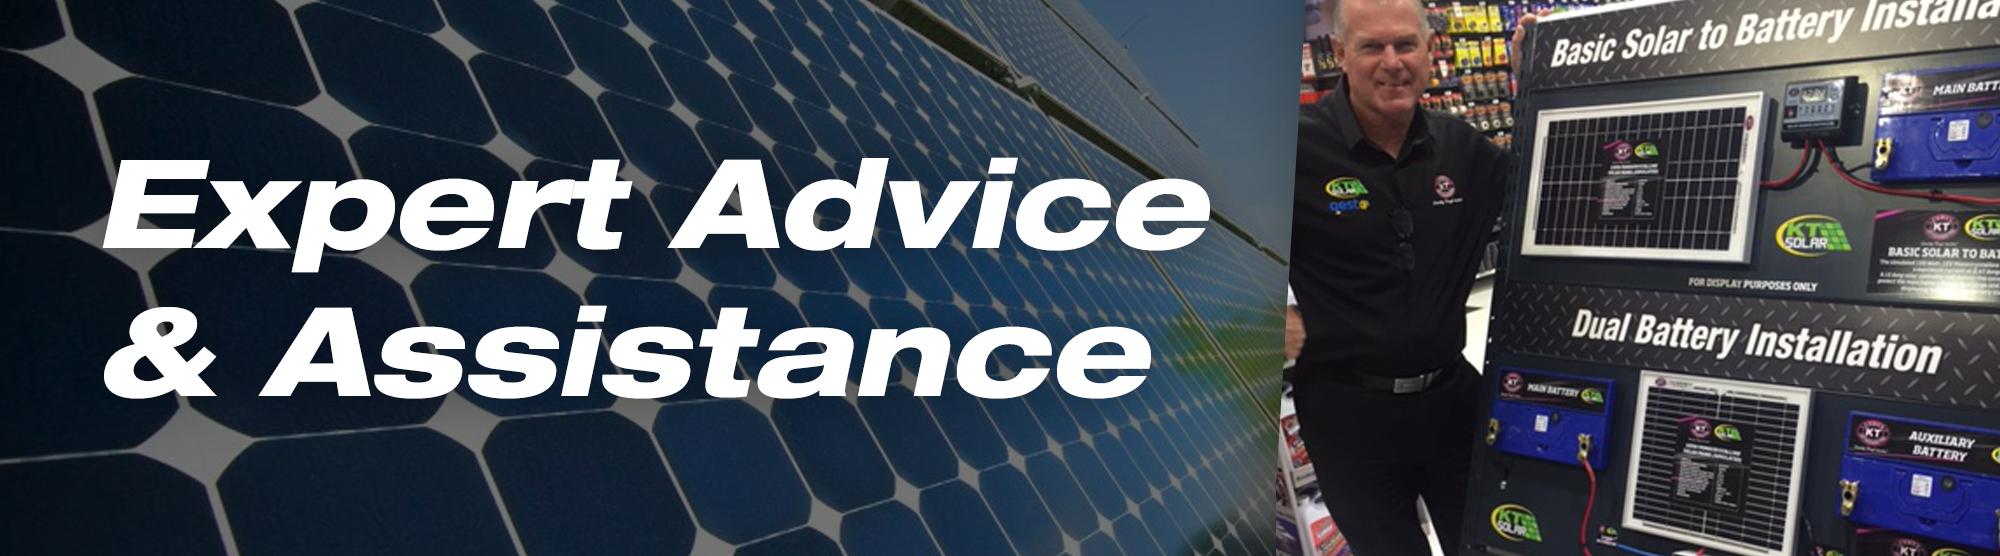 banner_Advice.jpg